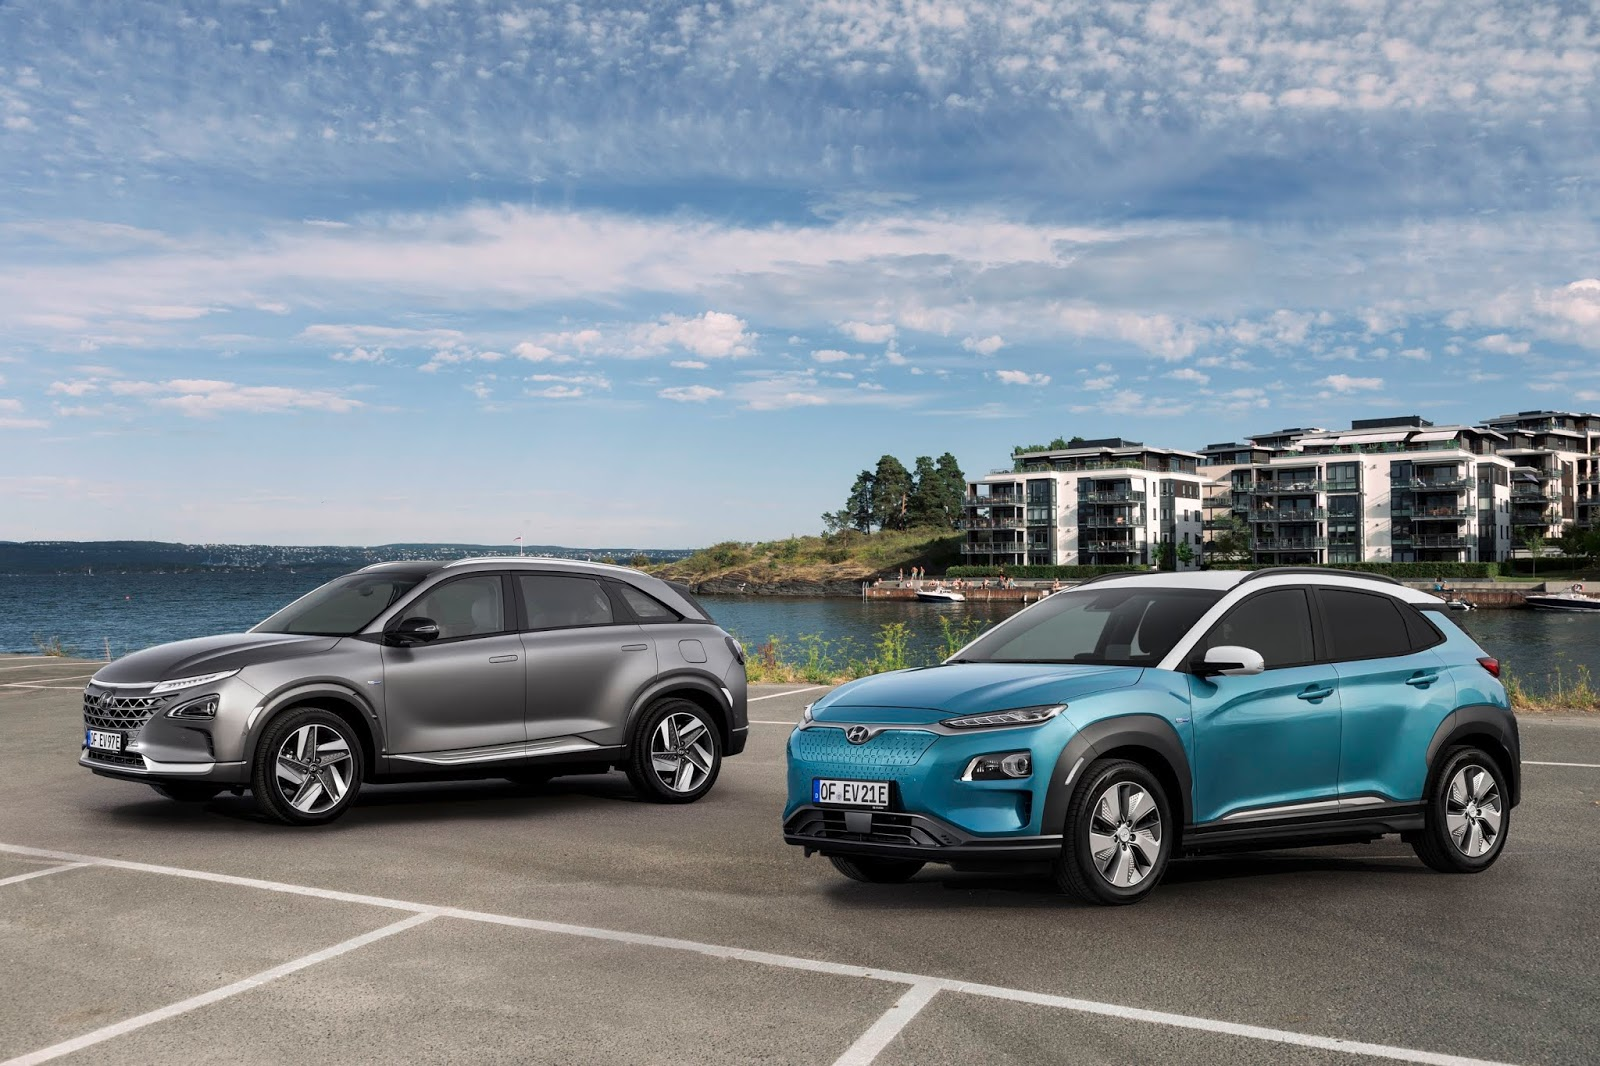 Kona2BElectric2B25262BNEXO Άλμα της Hyundai στα γερμανικά βραβεία Best Car 2019 Hyundai, Hyundai Ελλάς, βραβείο